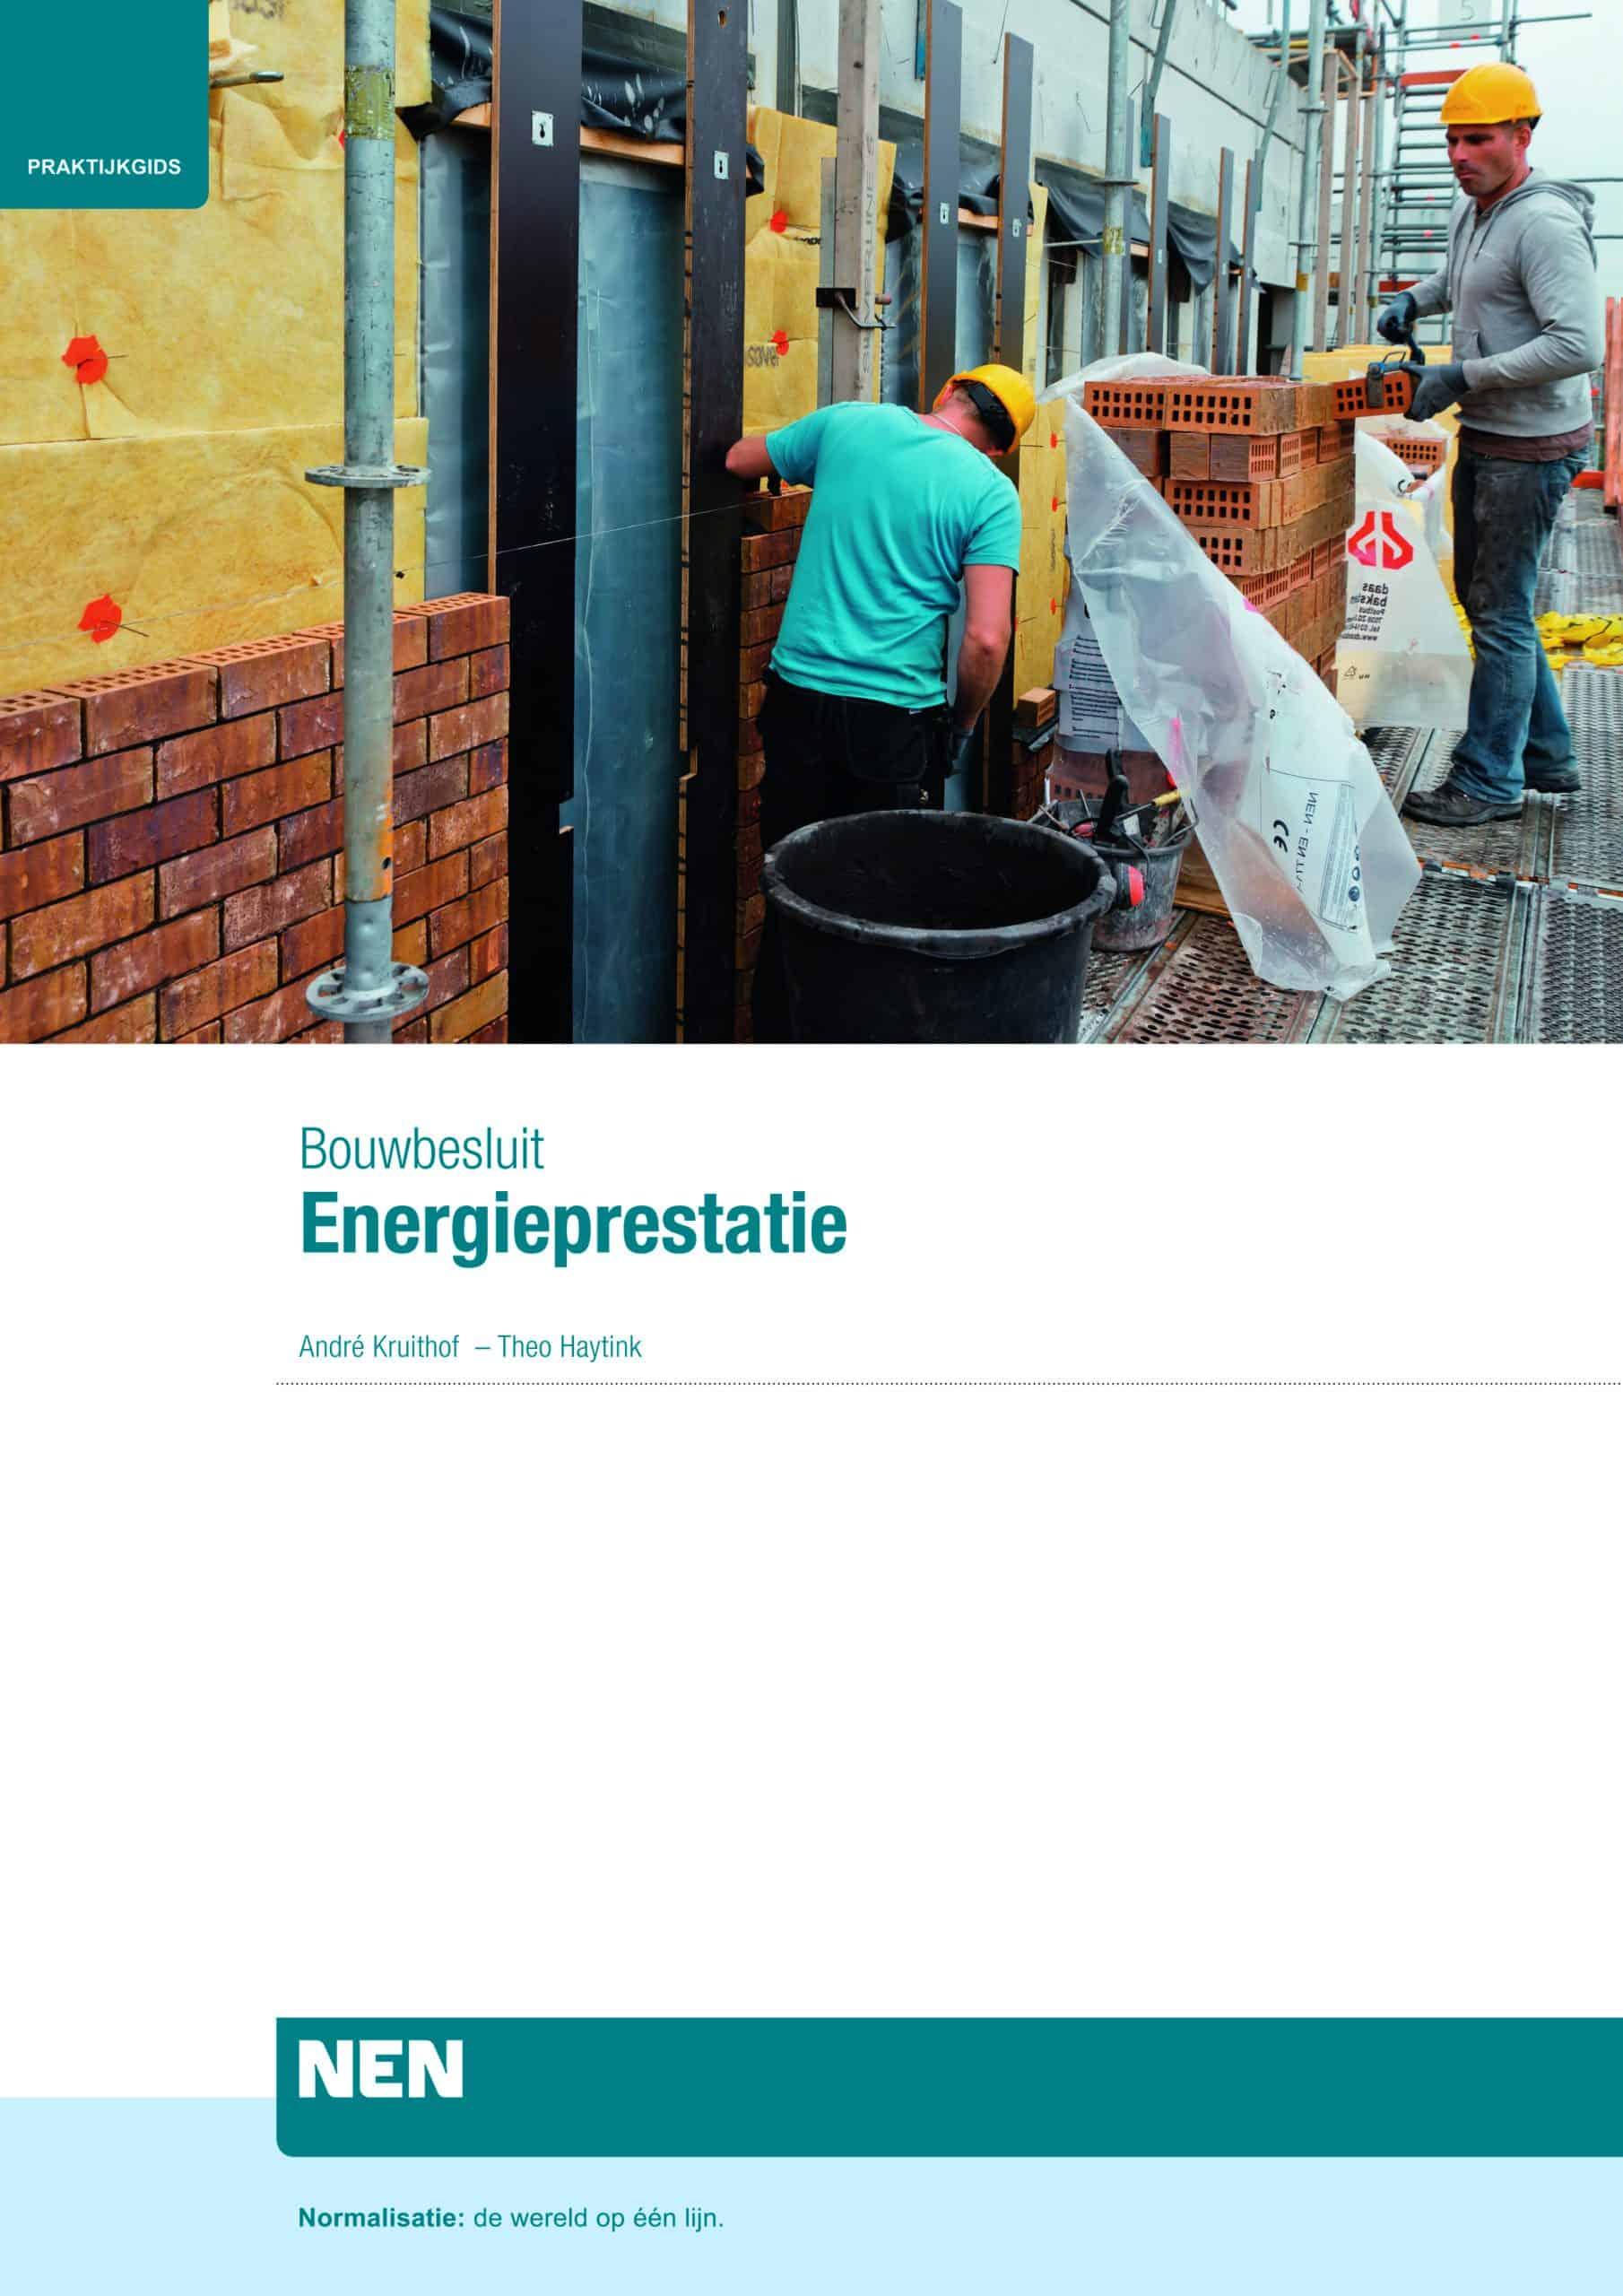 NEN_Omslag_PG_Energieprestaties_A4-1-scaled